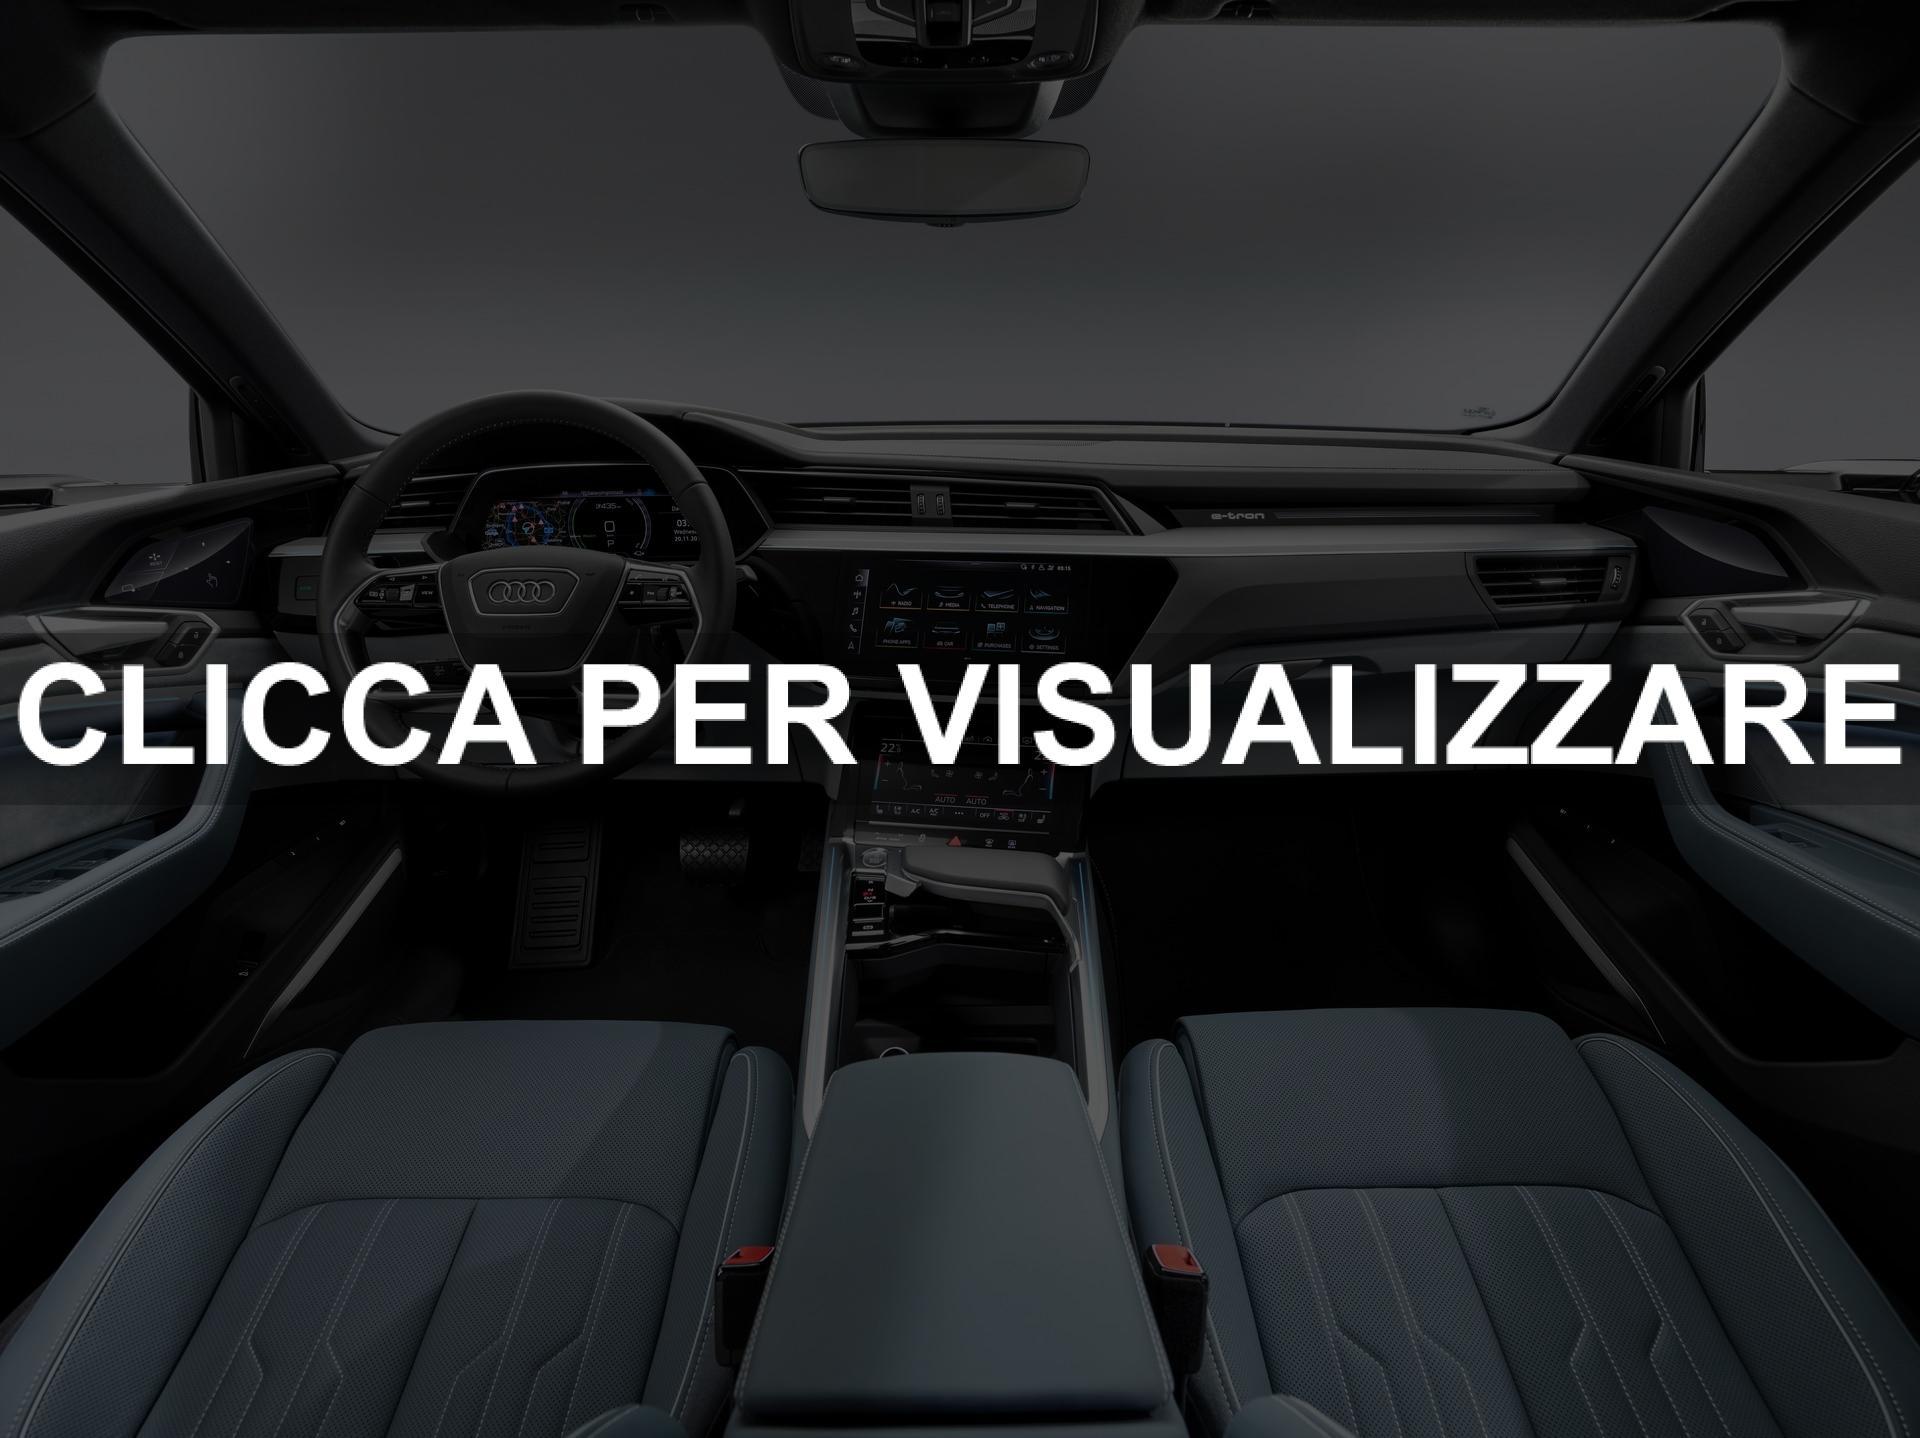 Plancia nuova Audi e tron Sportback 2020